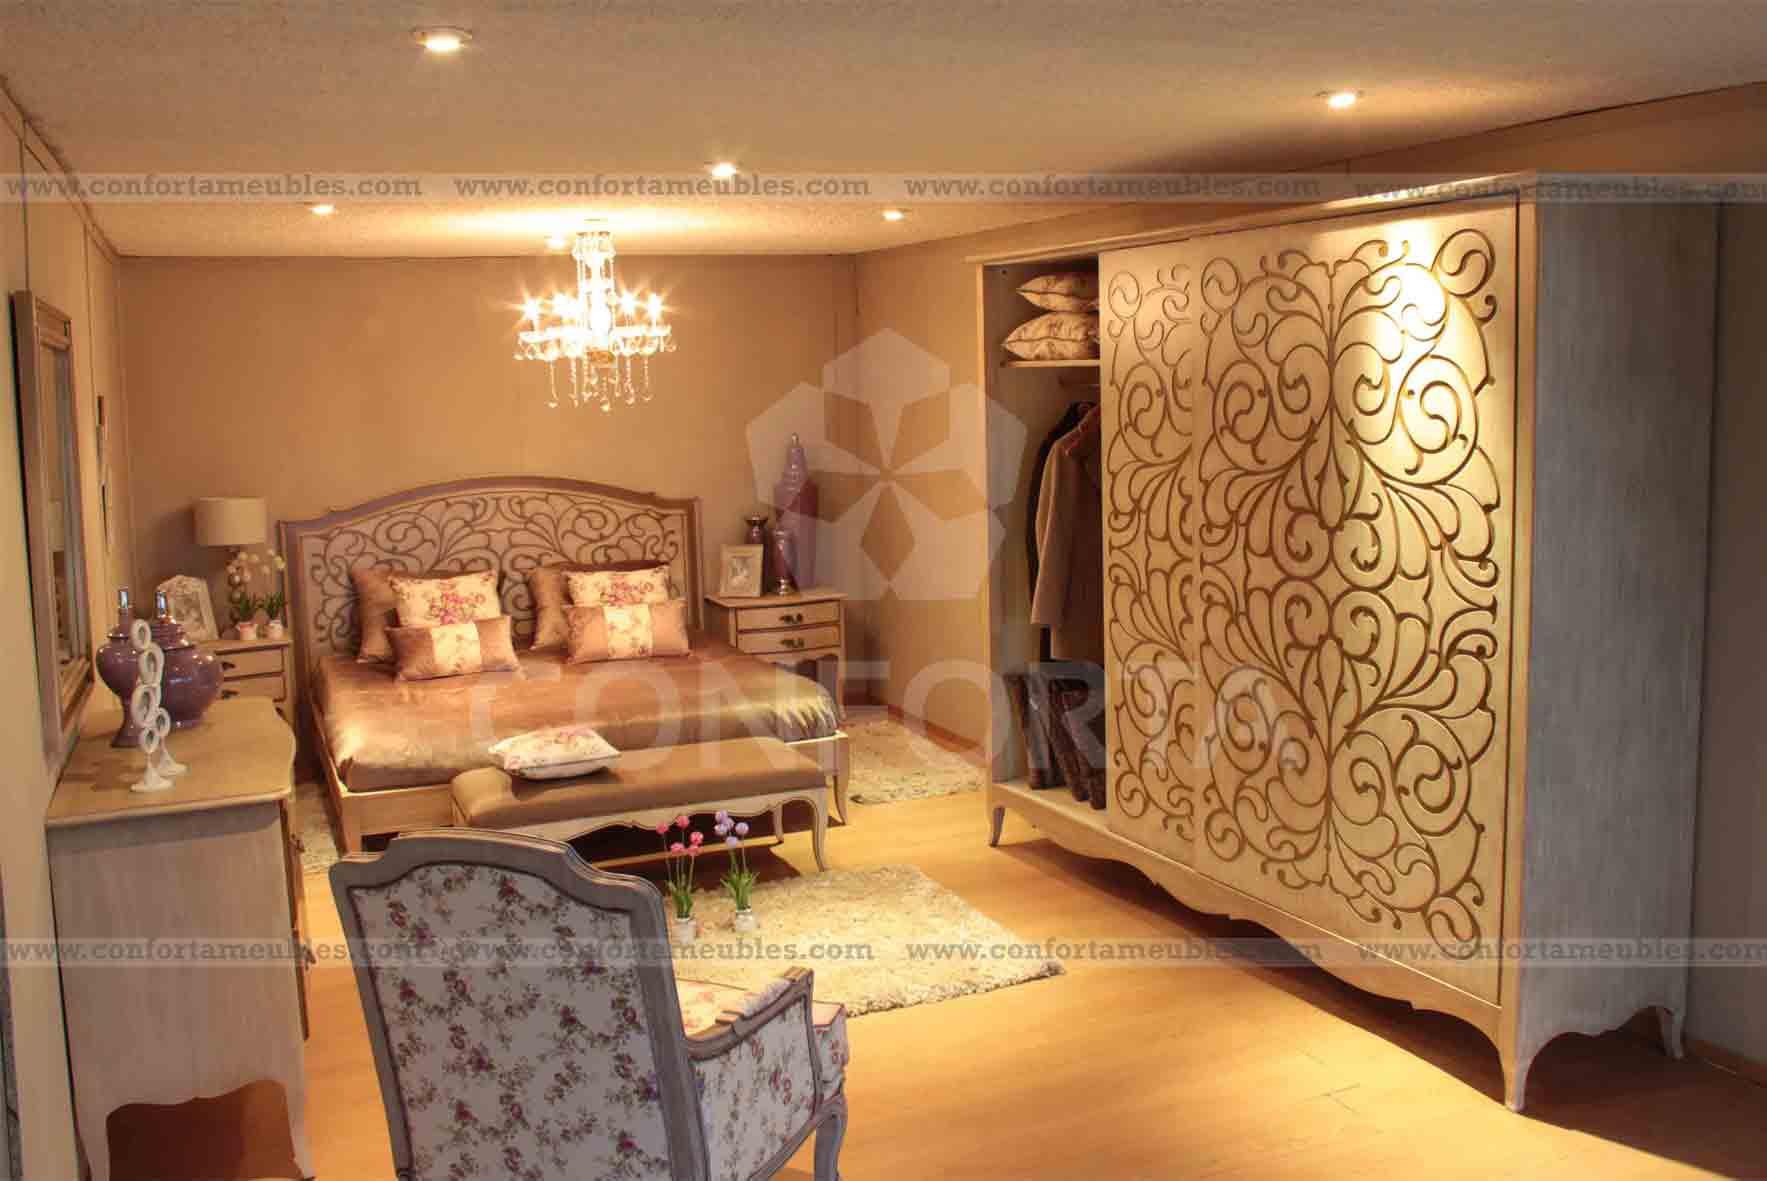 Meuble Kelibia Chambre A Coucher 2015 | Ides De Model Chambre A ...